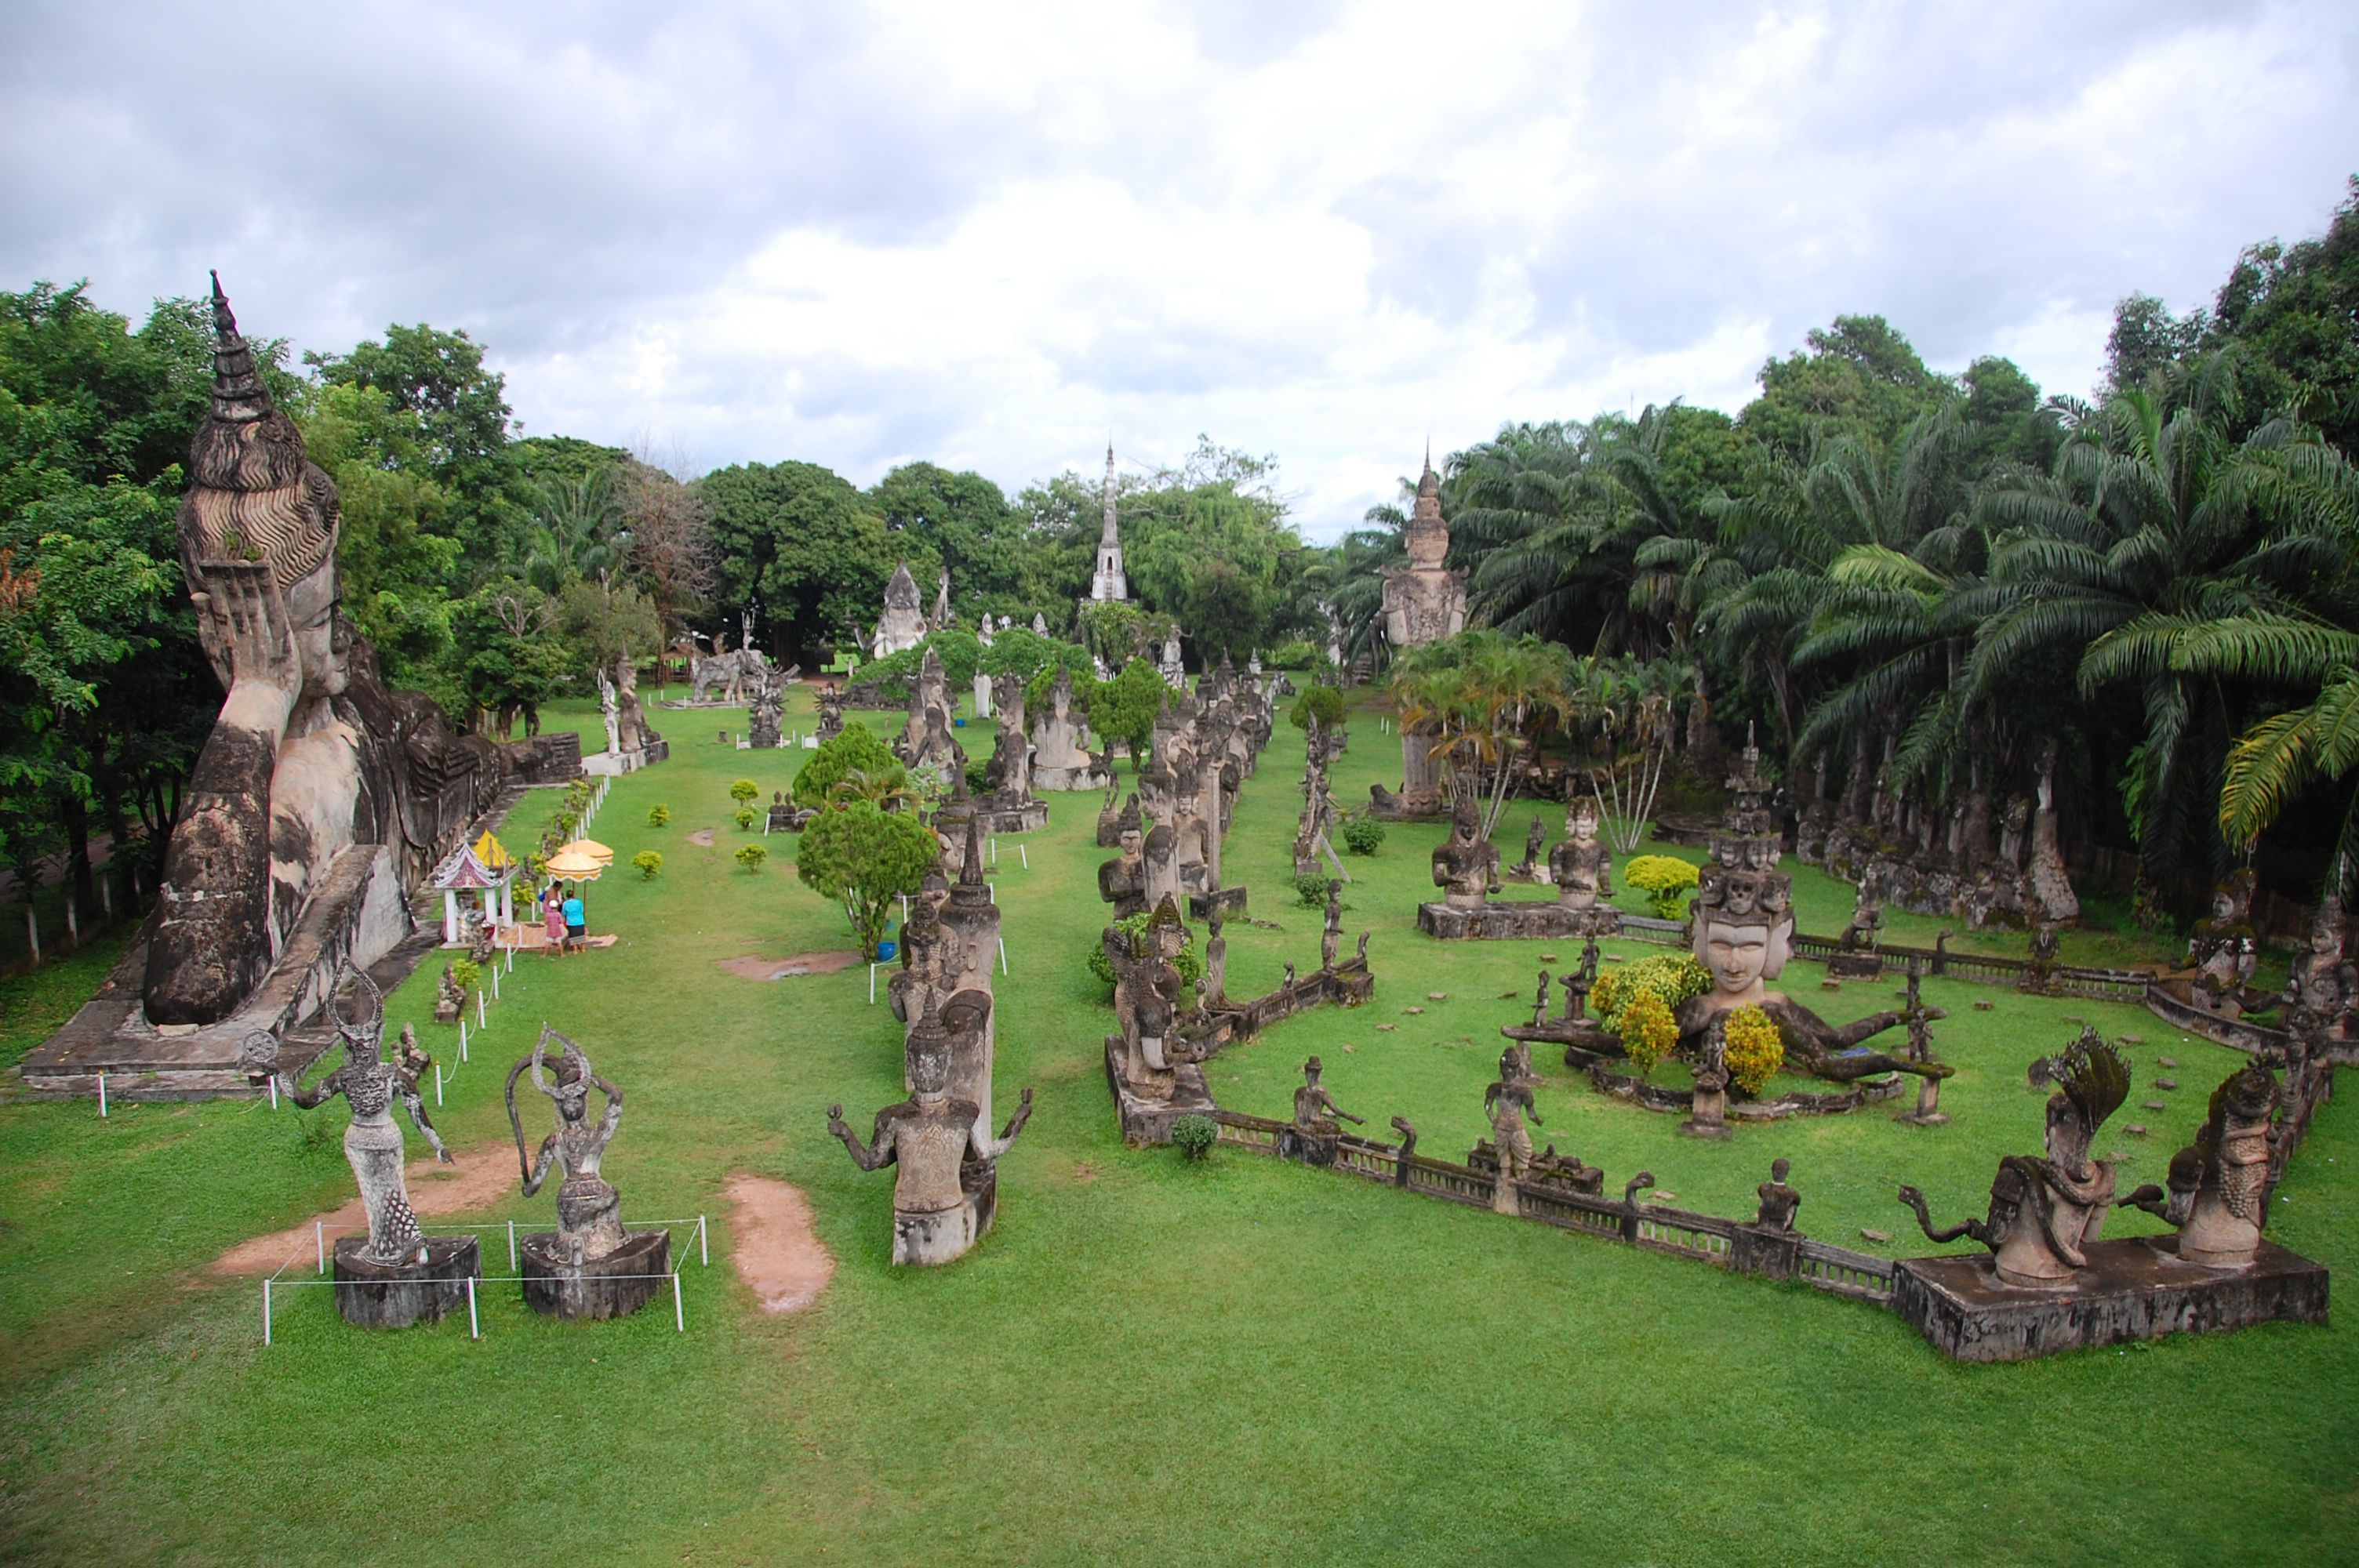 Visiting The Bizarre Xieng Khuan Buddha Park